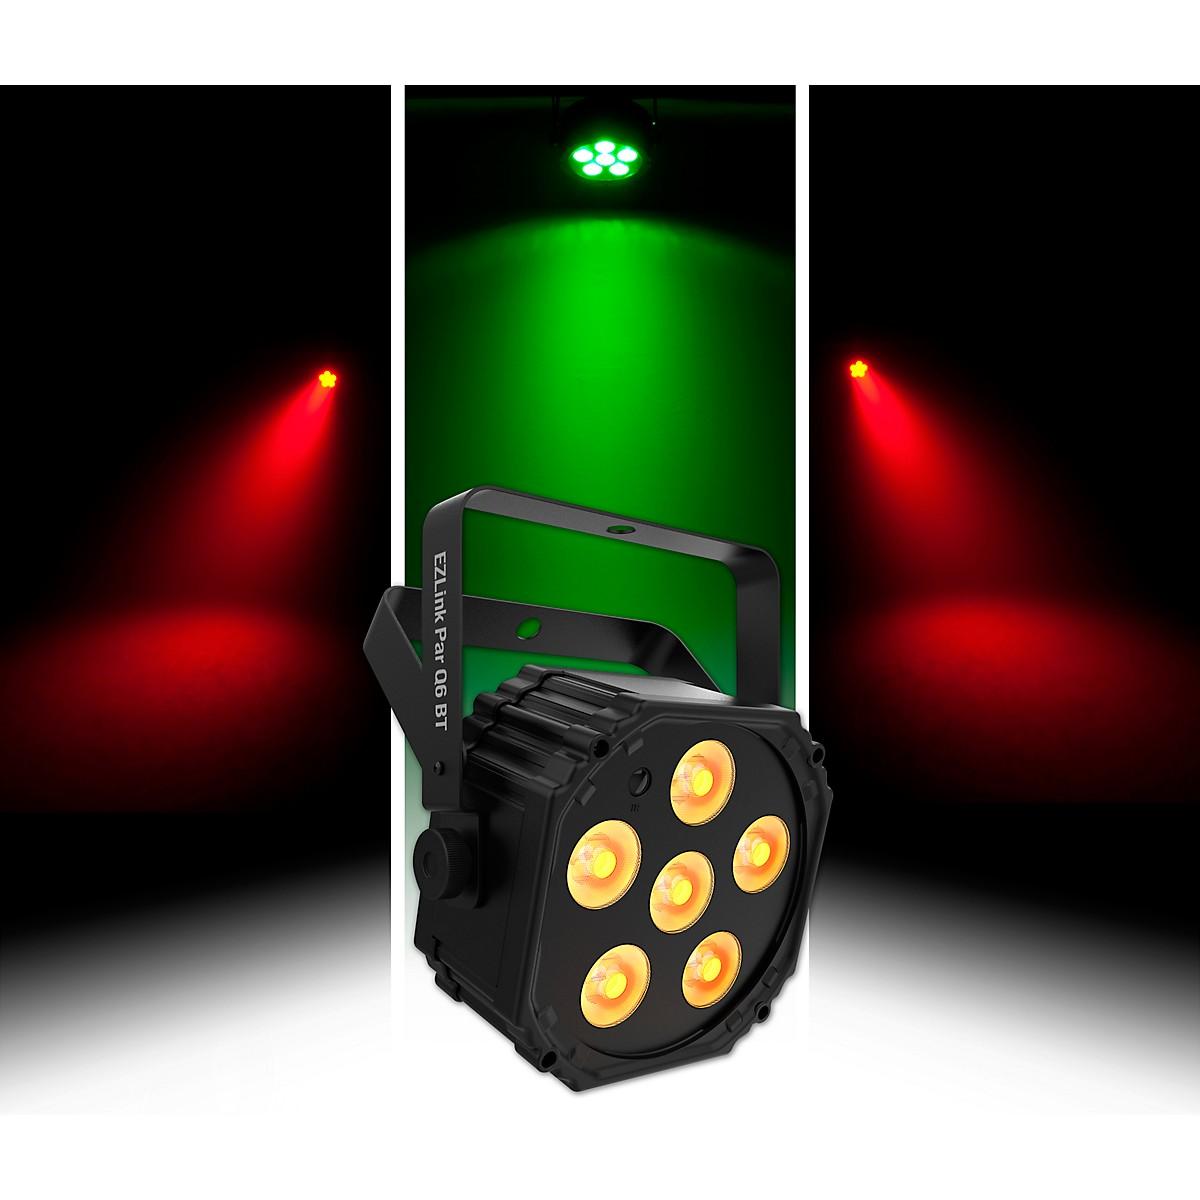 CHAUVET DJ EZLink Par Q6 BT Wireless RGBA LED Wash Light with Bluetooth